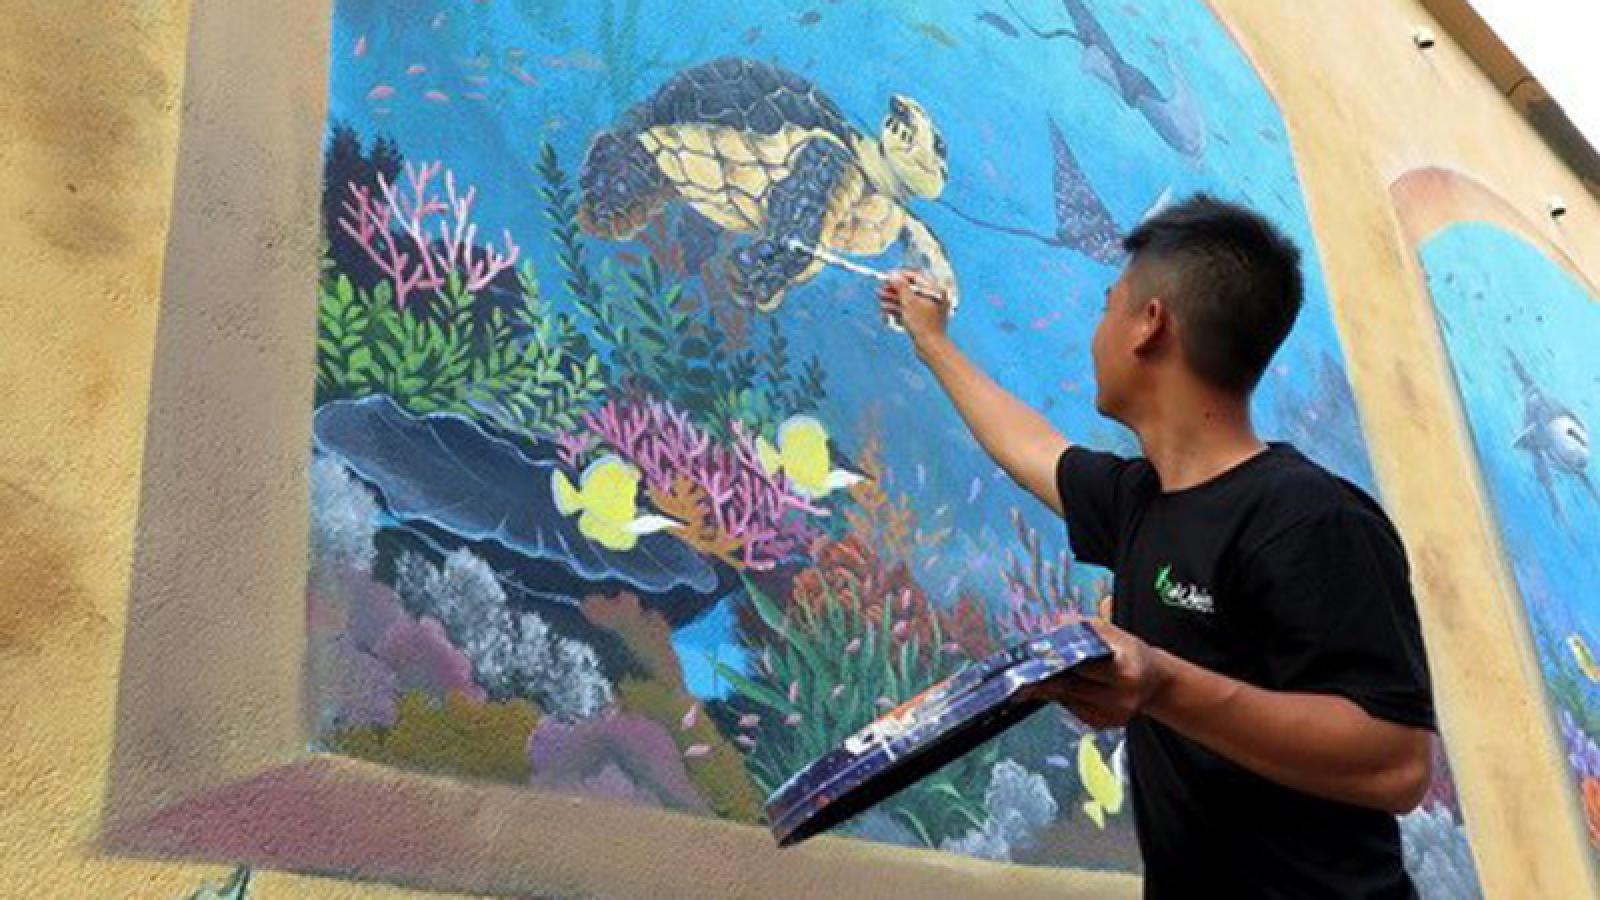 HCM City to host first street art festival in Vietnam